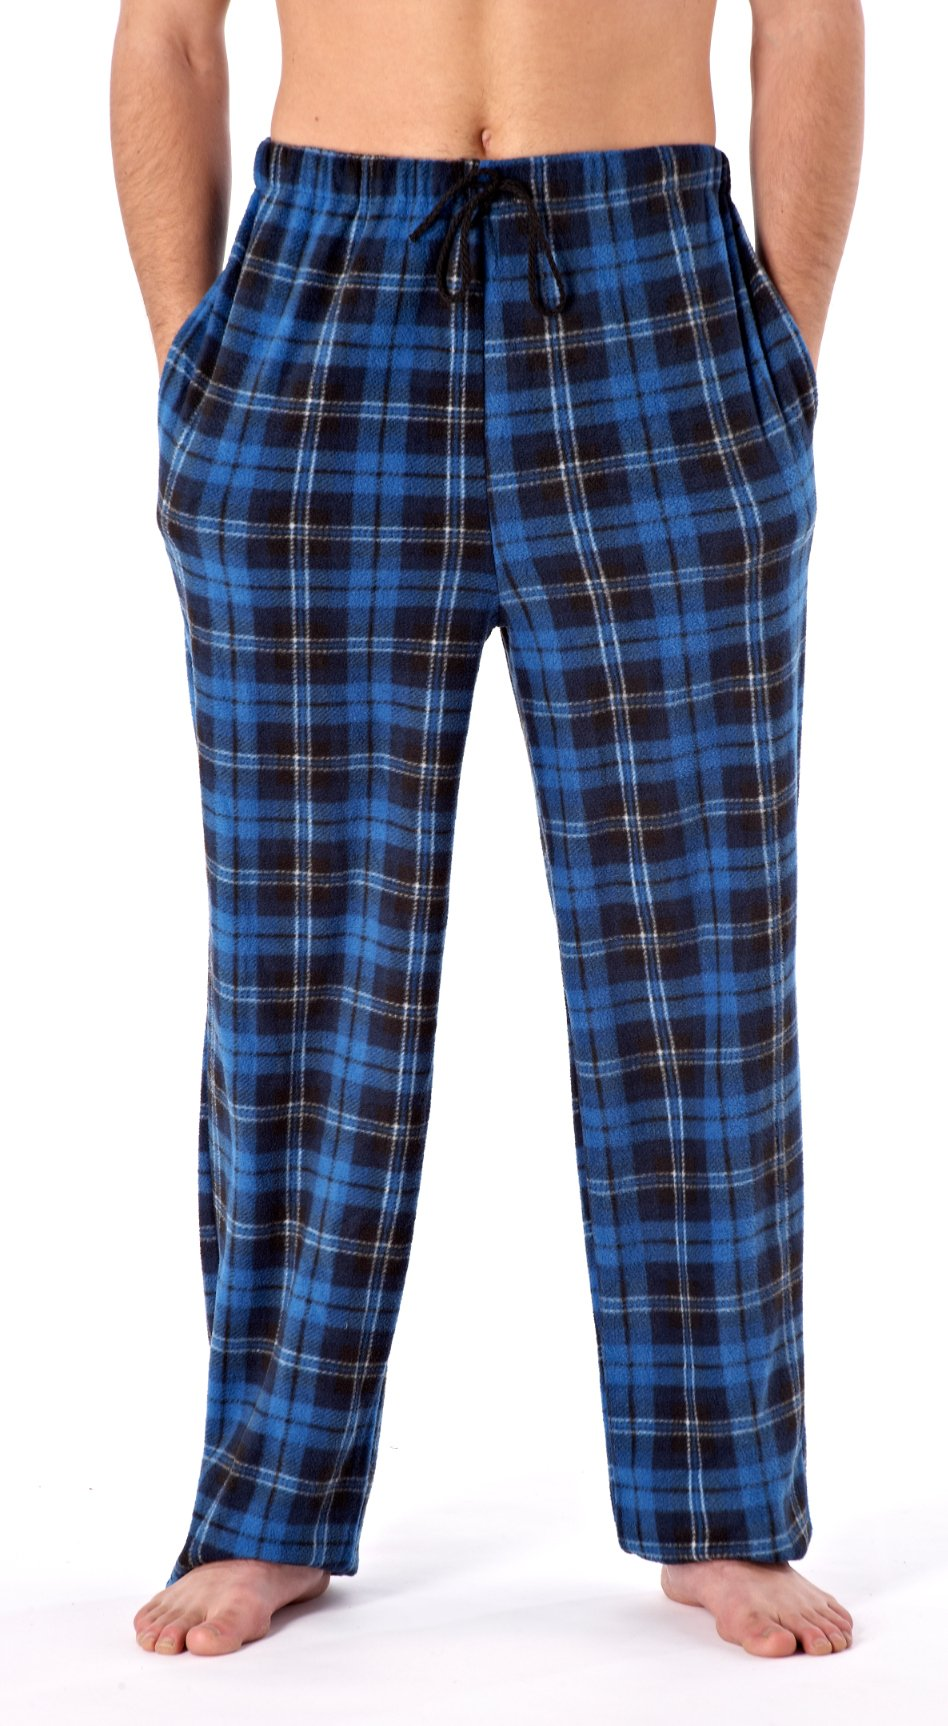 621421a7b8 Harvey James da Uomo Morbida Quadri Pile Pigiama Pantaloni da casa product  image